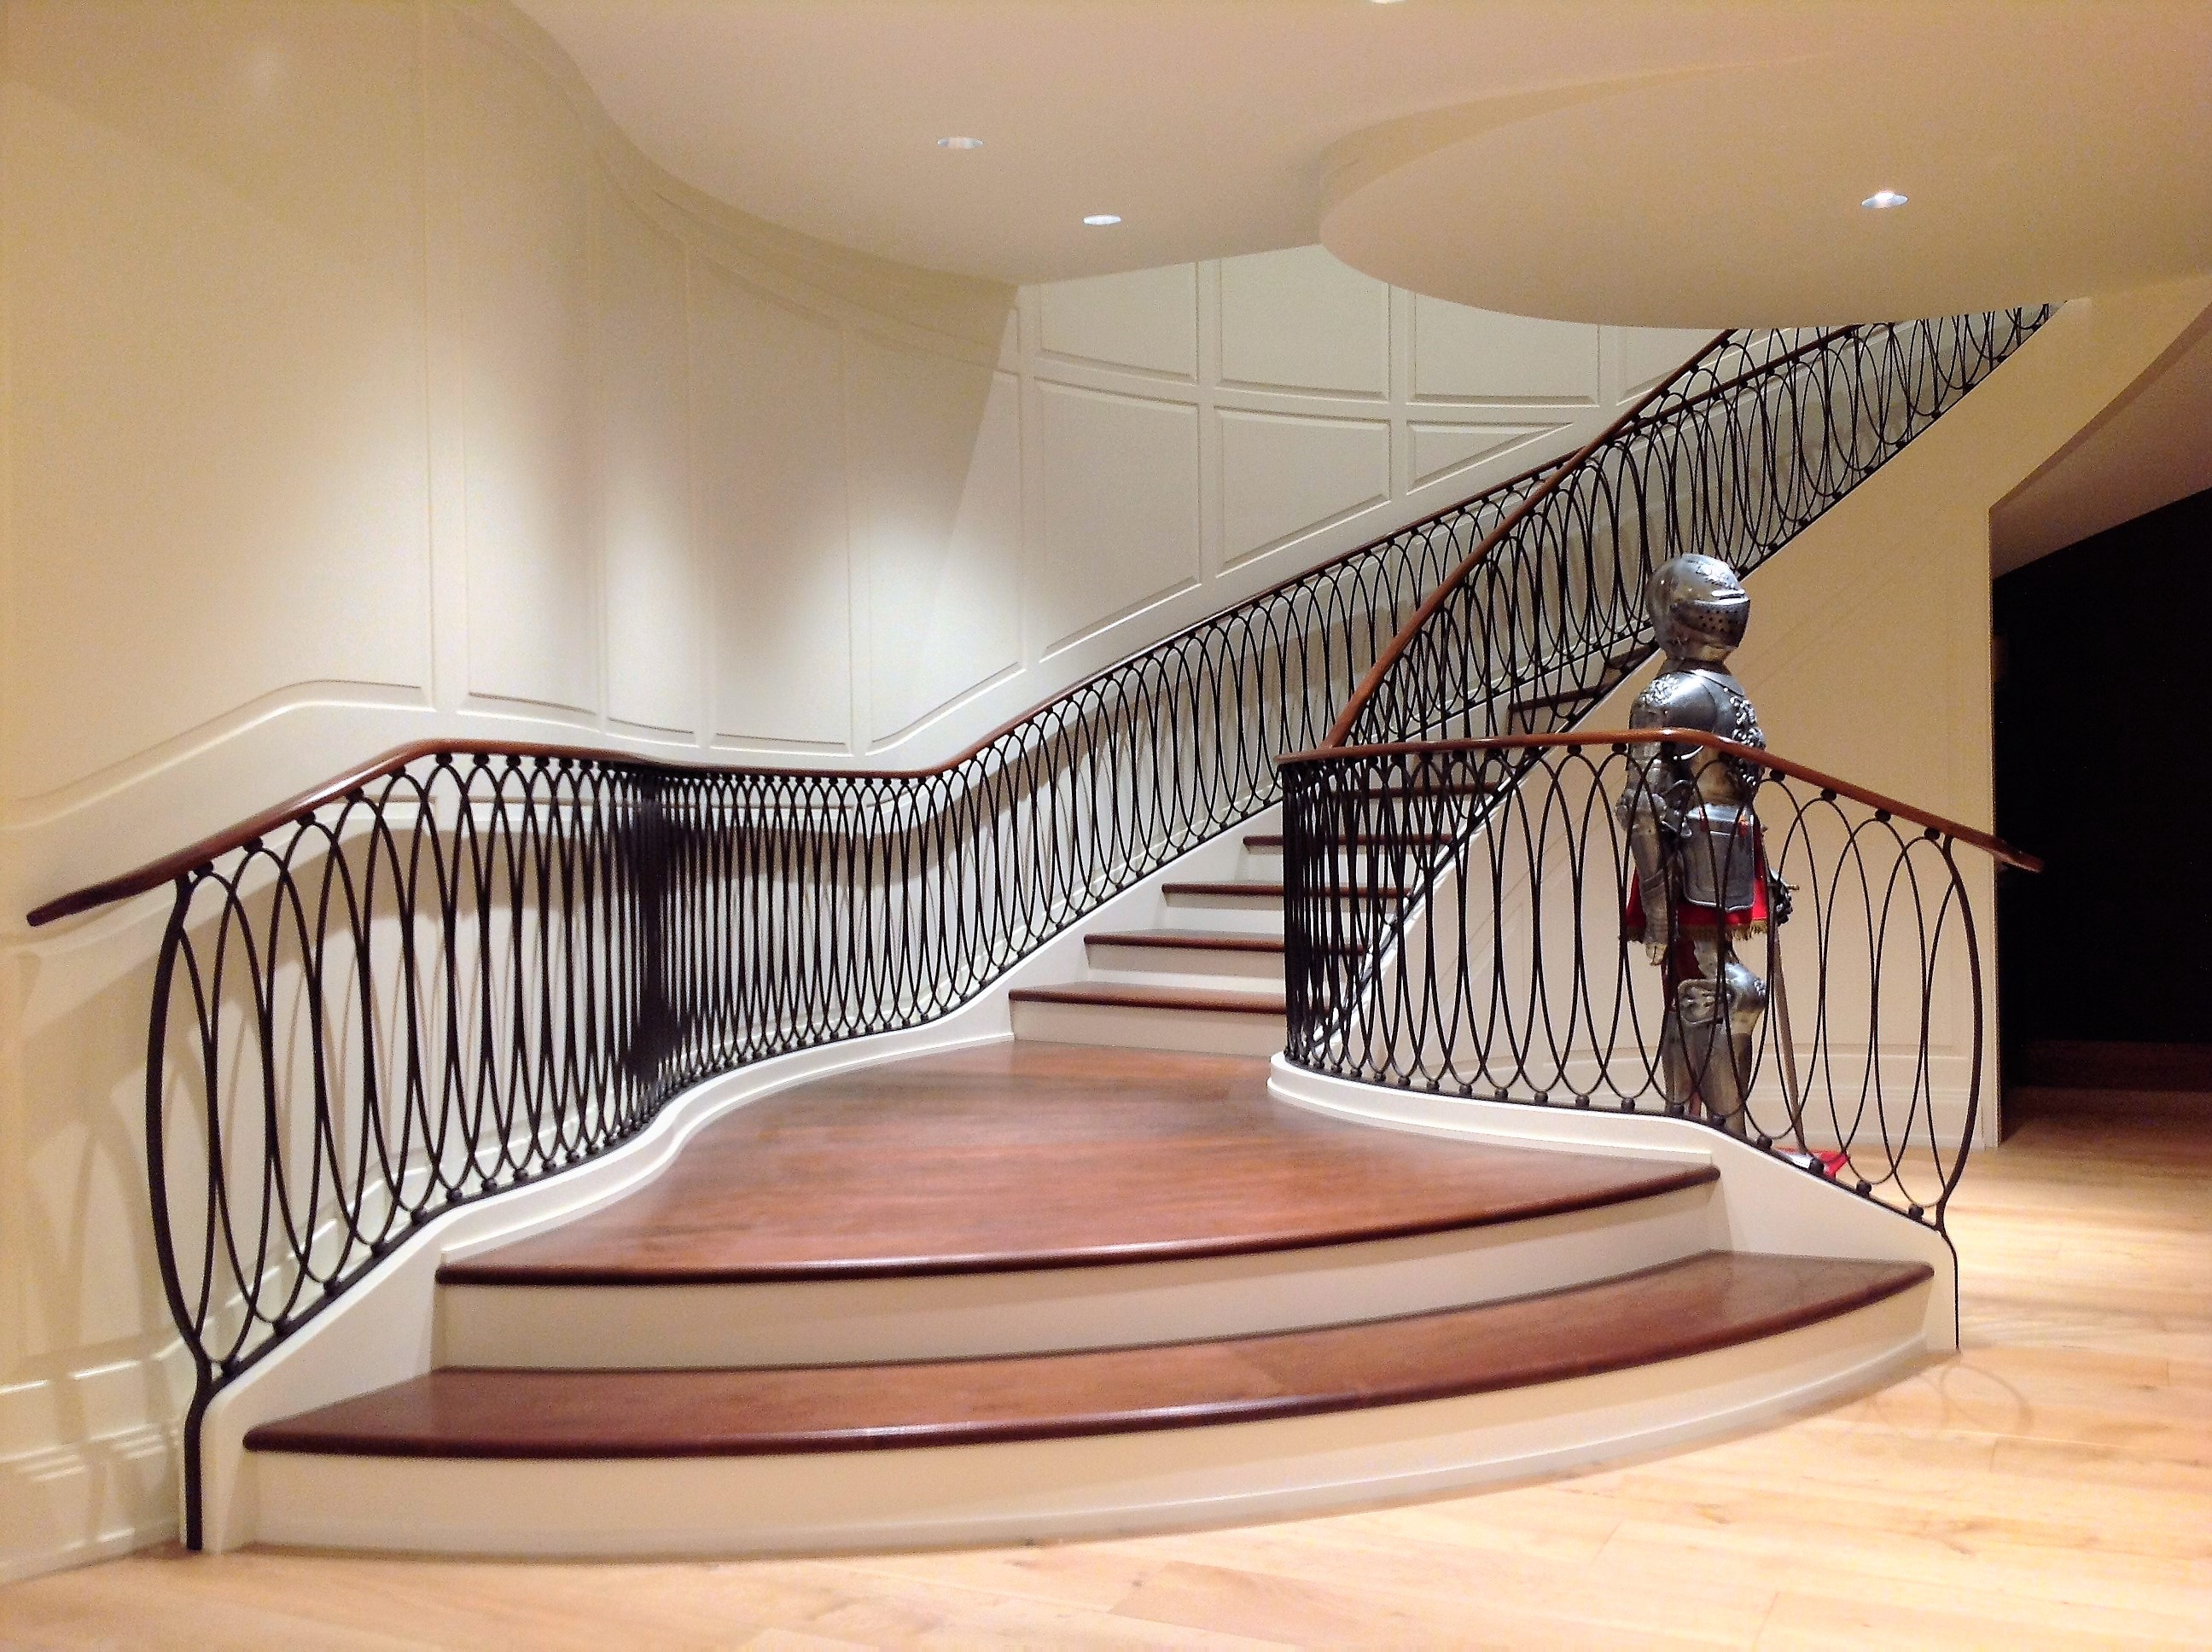 Elliptical Oval Iron Railing Contemporary Railings Interior